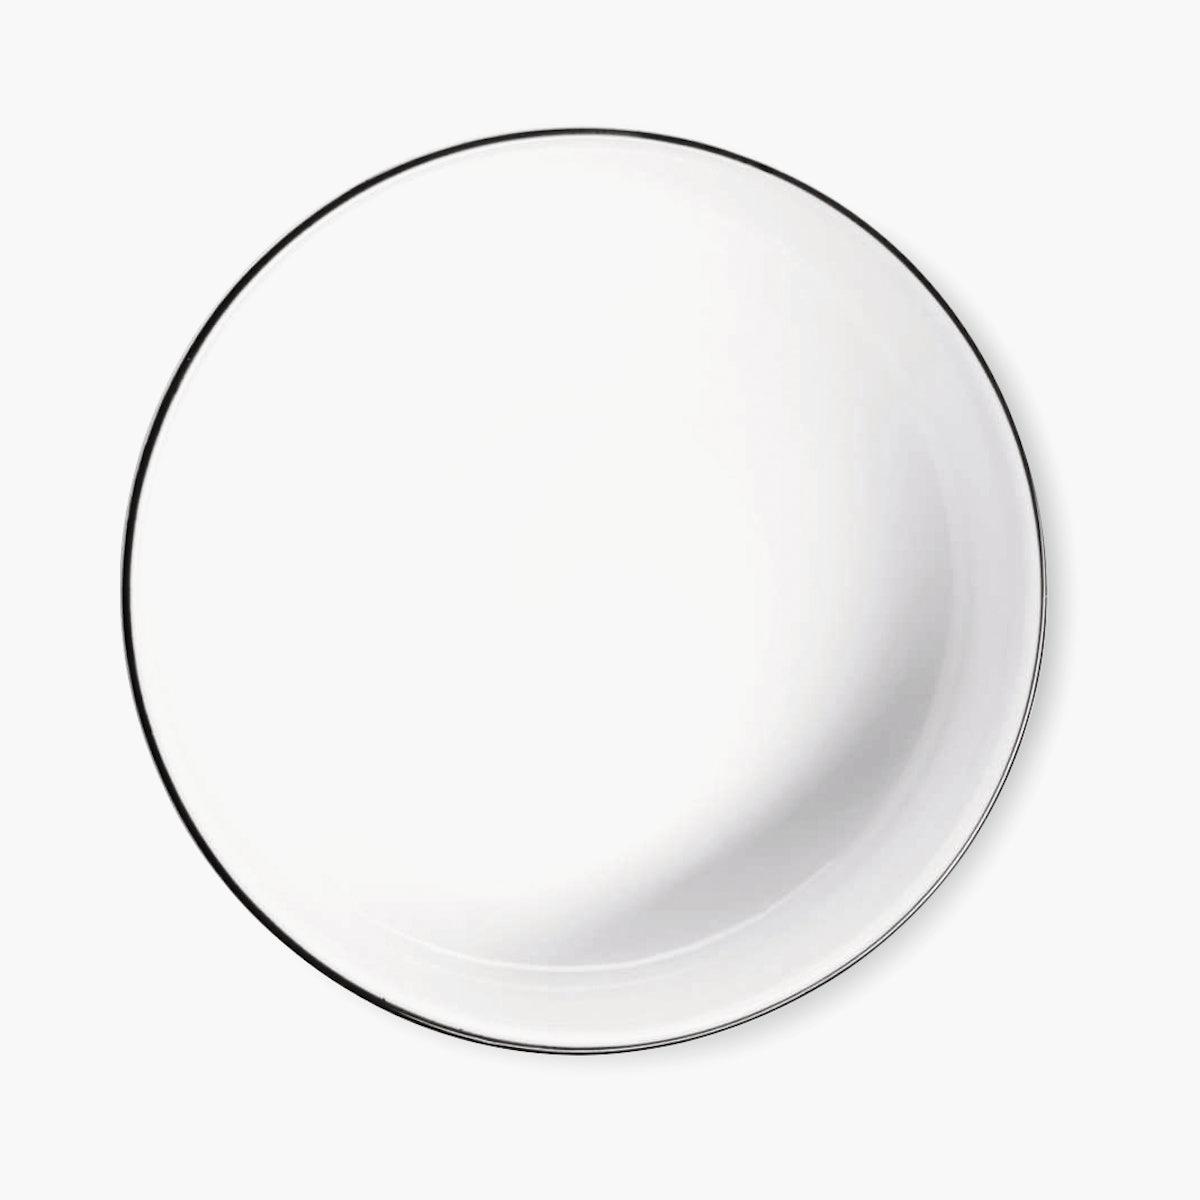 Oco Small Bowls, Set of 6